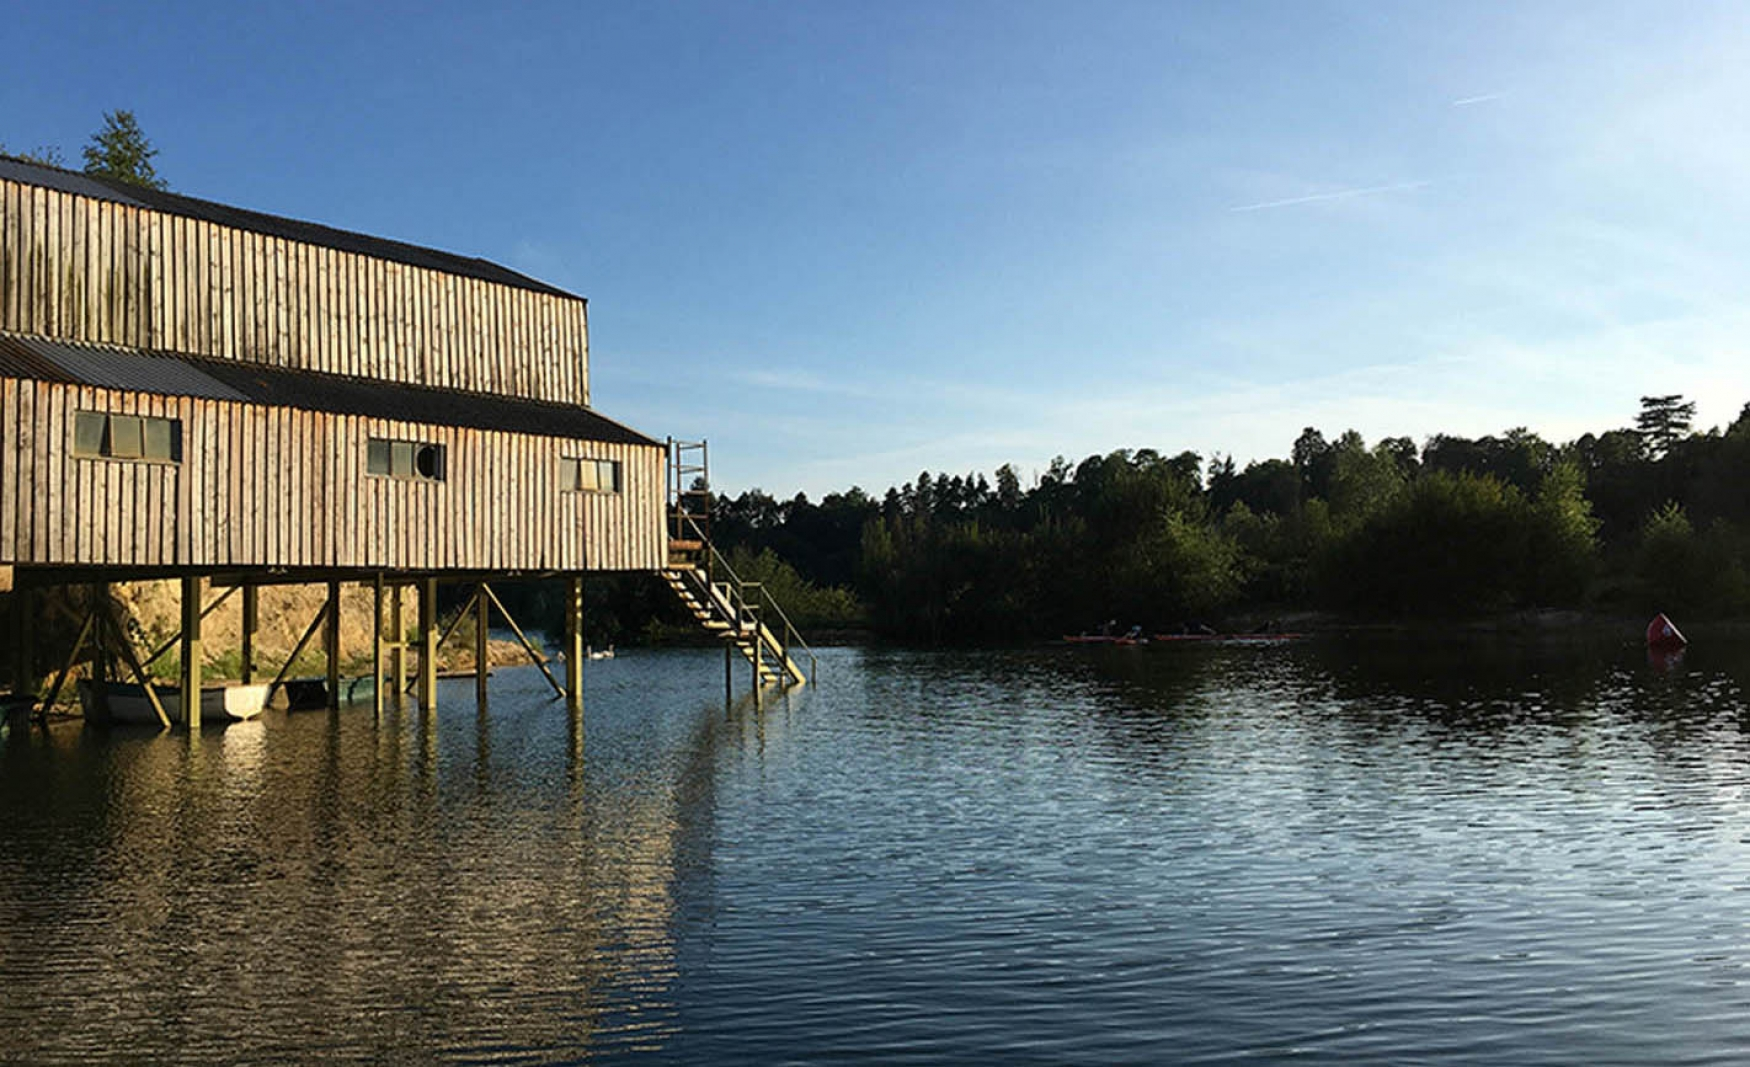 buckland-park-lake-boat-shed-fiesta-fields